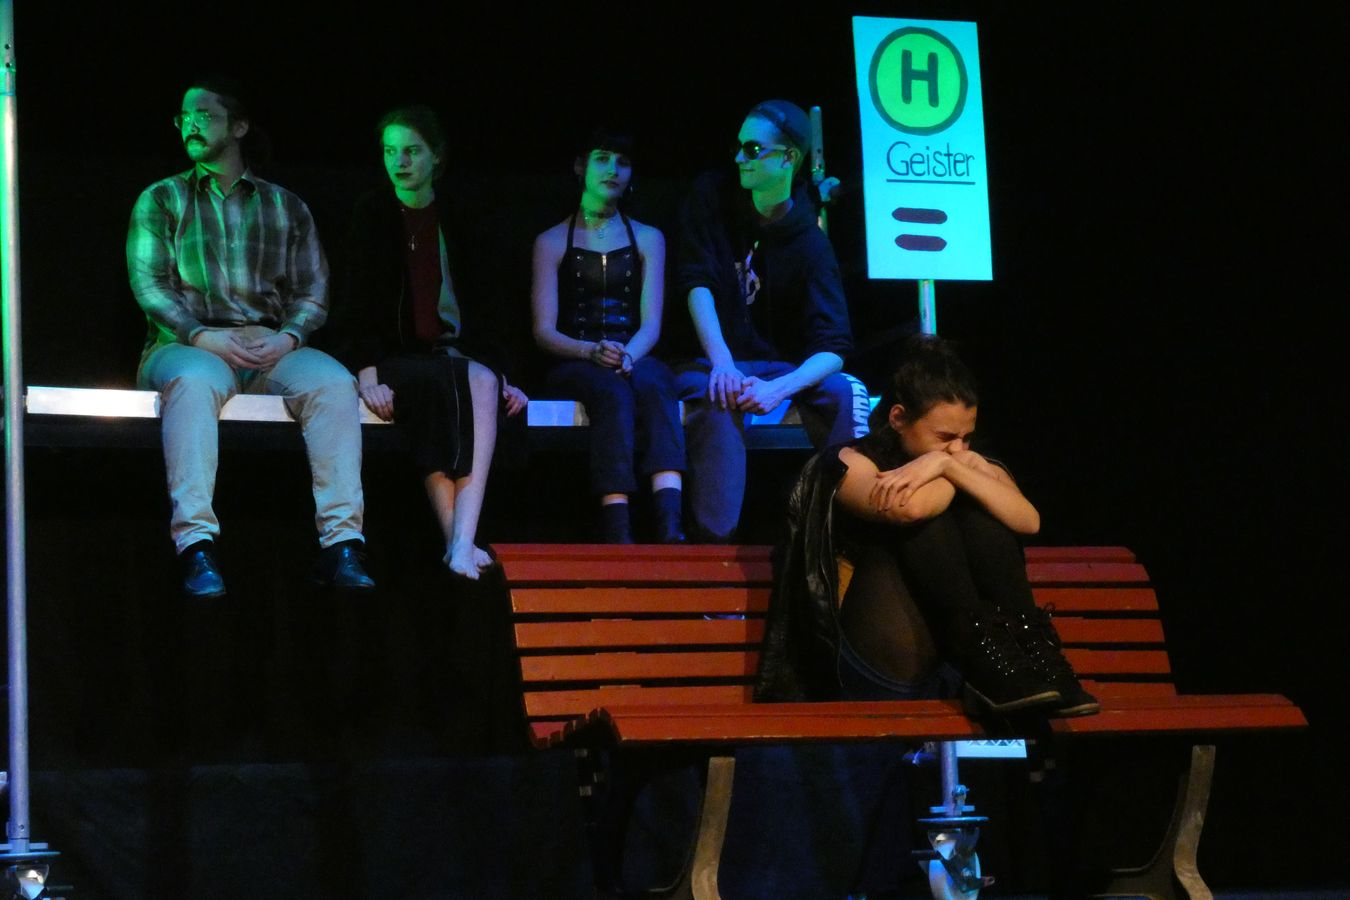 20.01.24 Theater Haltestelle.geister 31